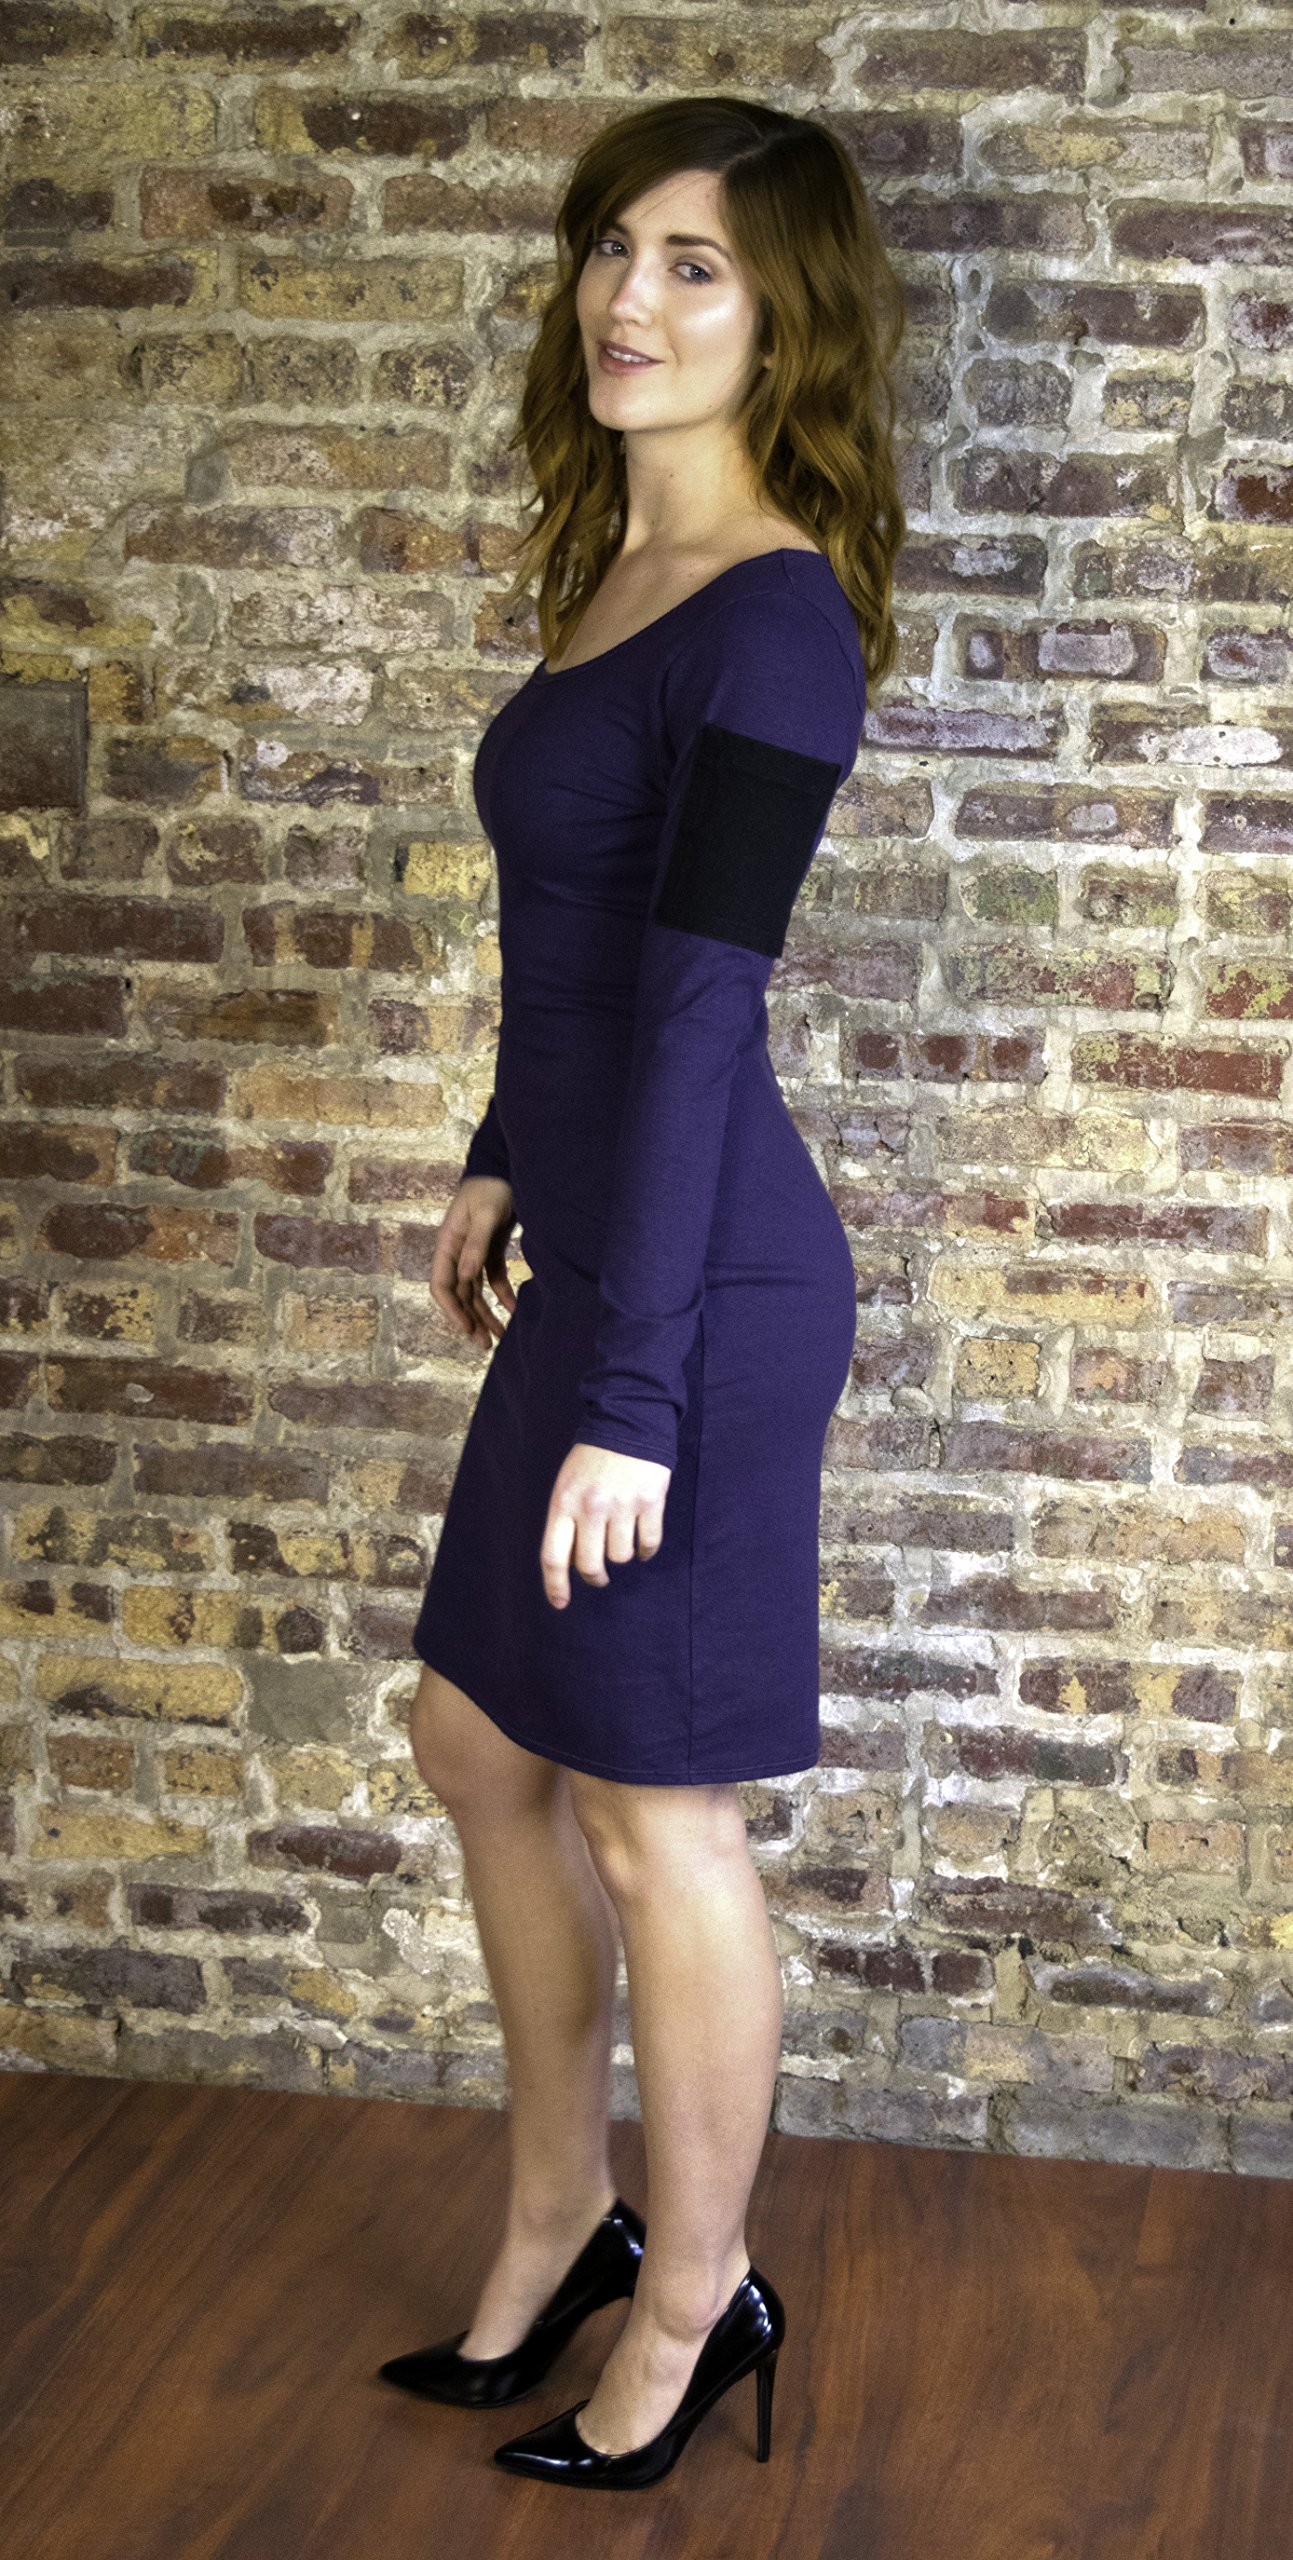 Dress with Long Sleeves & Pocket - Hemp & Organic Stretch Jersey